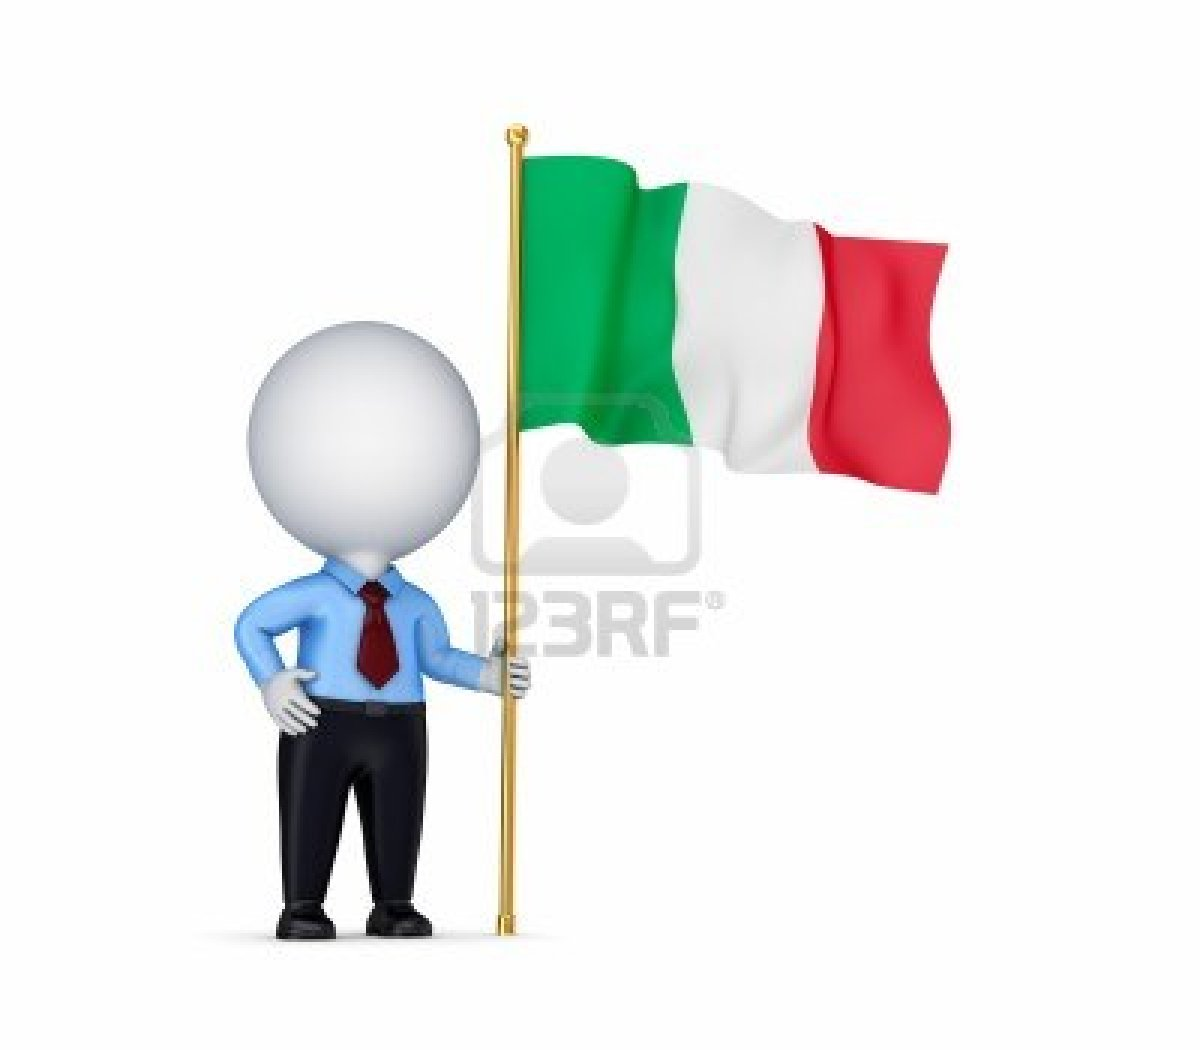 http://2.bp.blogspot.com/-YATkc5nPVy8/US0MlSE37vI/AAAAAAAAFMQ/sdXfXyiZ3-4/s1600/14072268-3d-piccola-persona-con-una-bandiera-italiana-in-una-mano.jpg